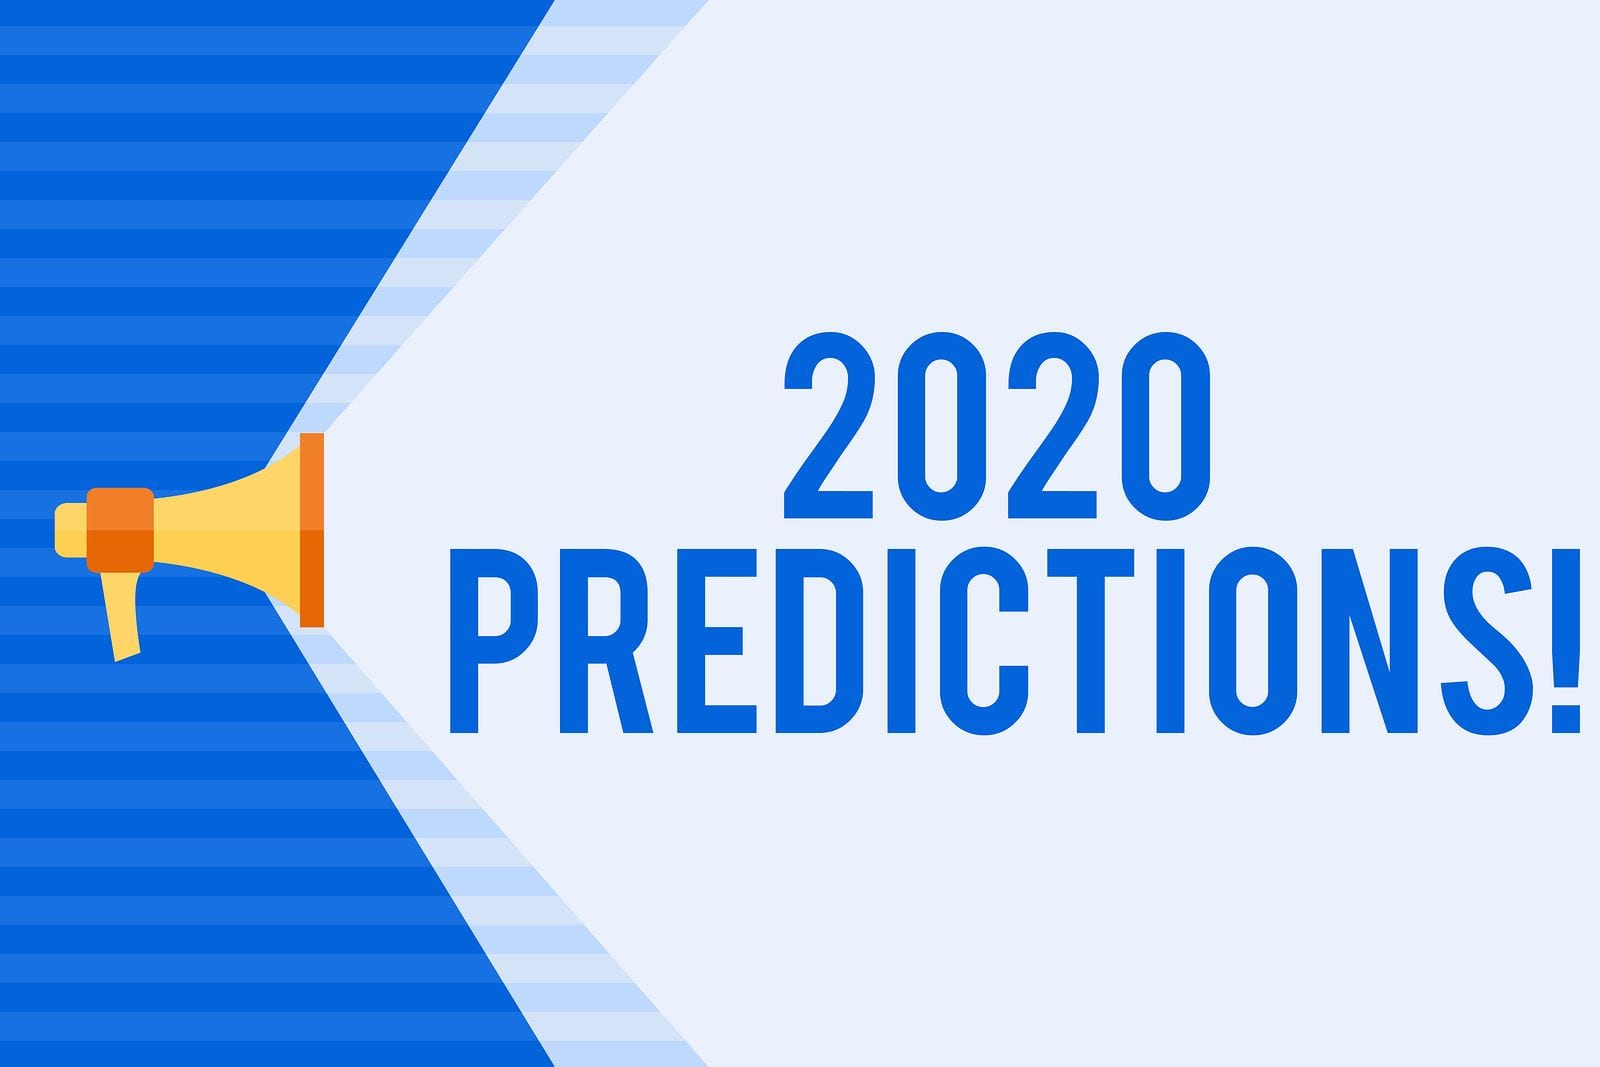 Mortgage Rate Trends 2020.Us Housing Market Predictions 2020 Mashvisor